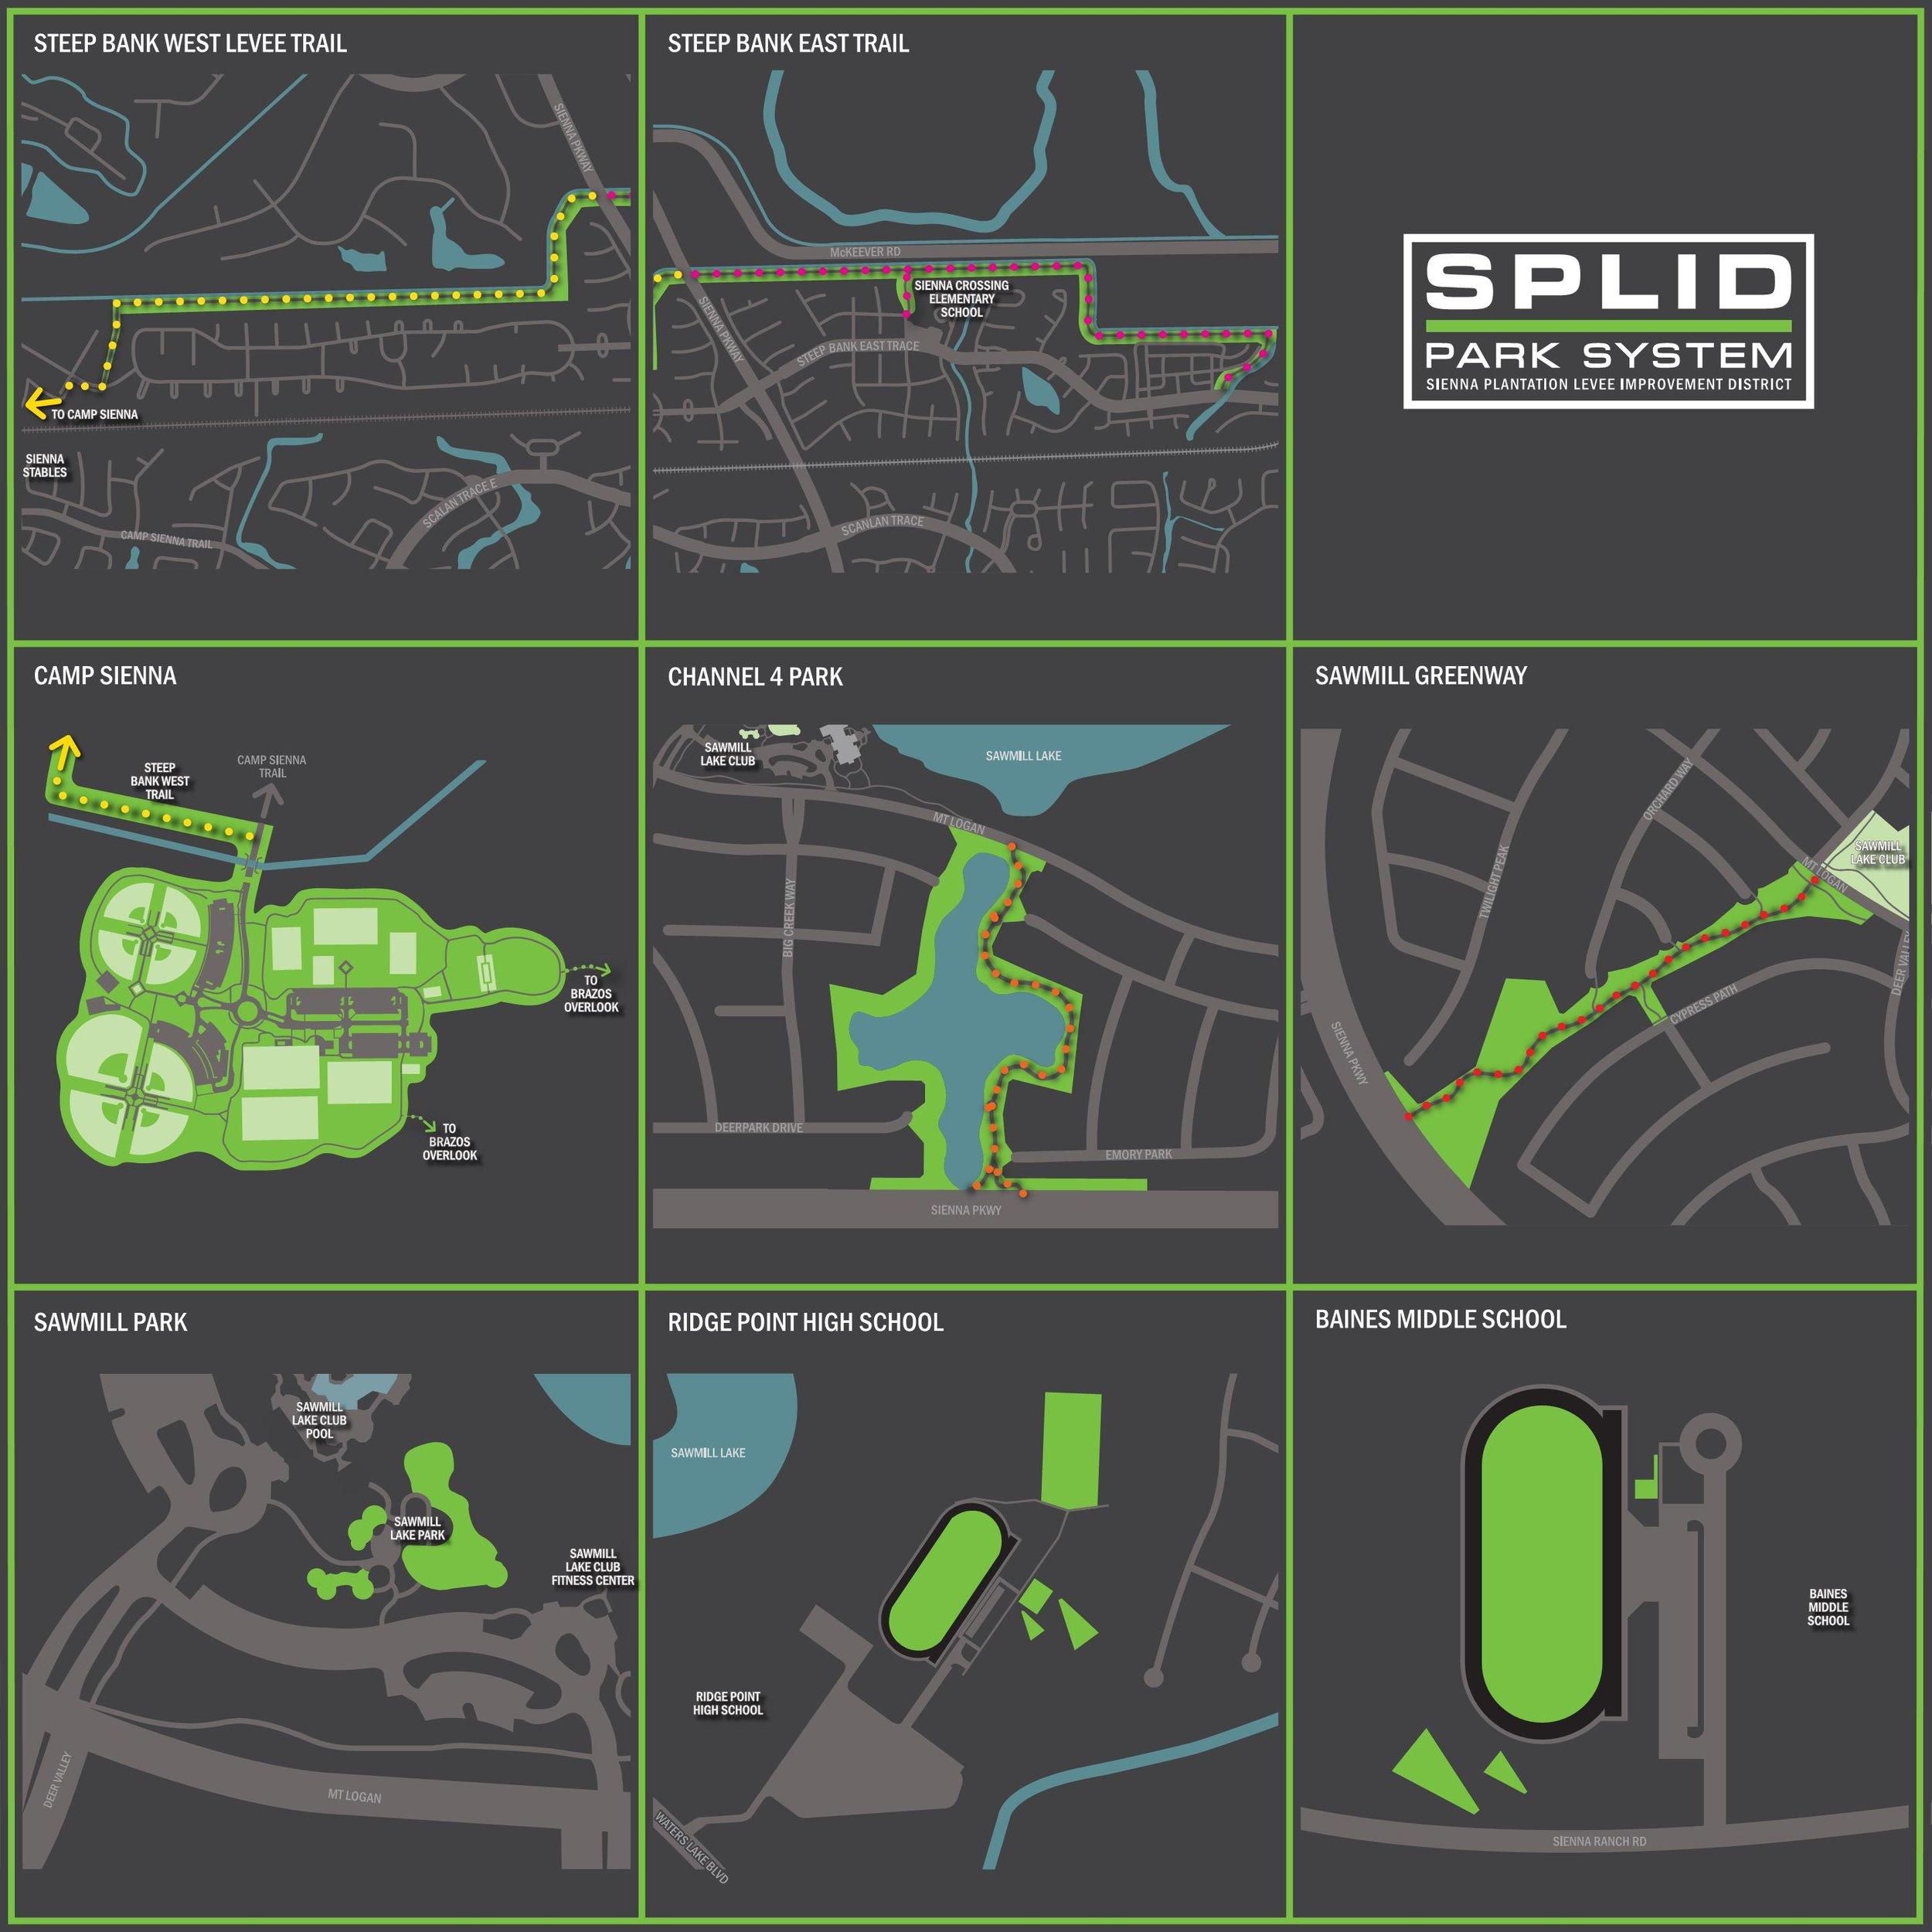 Sienna Plantation Levee Improvement District Web Map  TBG Partners - Missouri City, TX  Design team member for the development of a series of web maps for the parks under the purview of the Sienna Plantation Levee Improvement District.